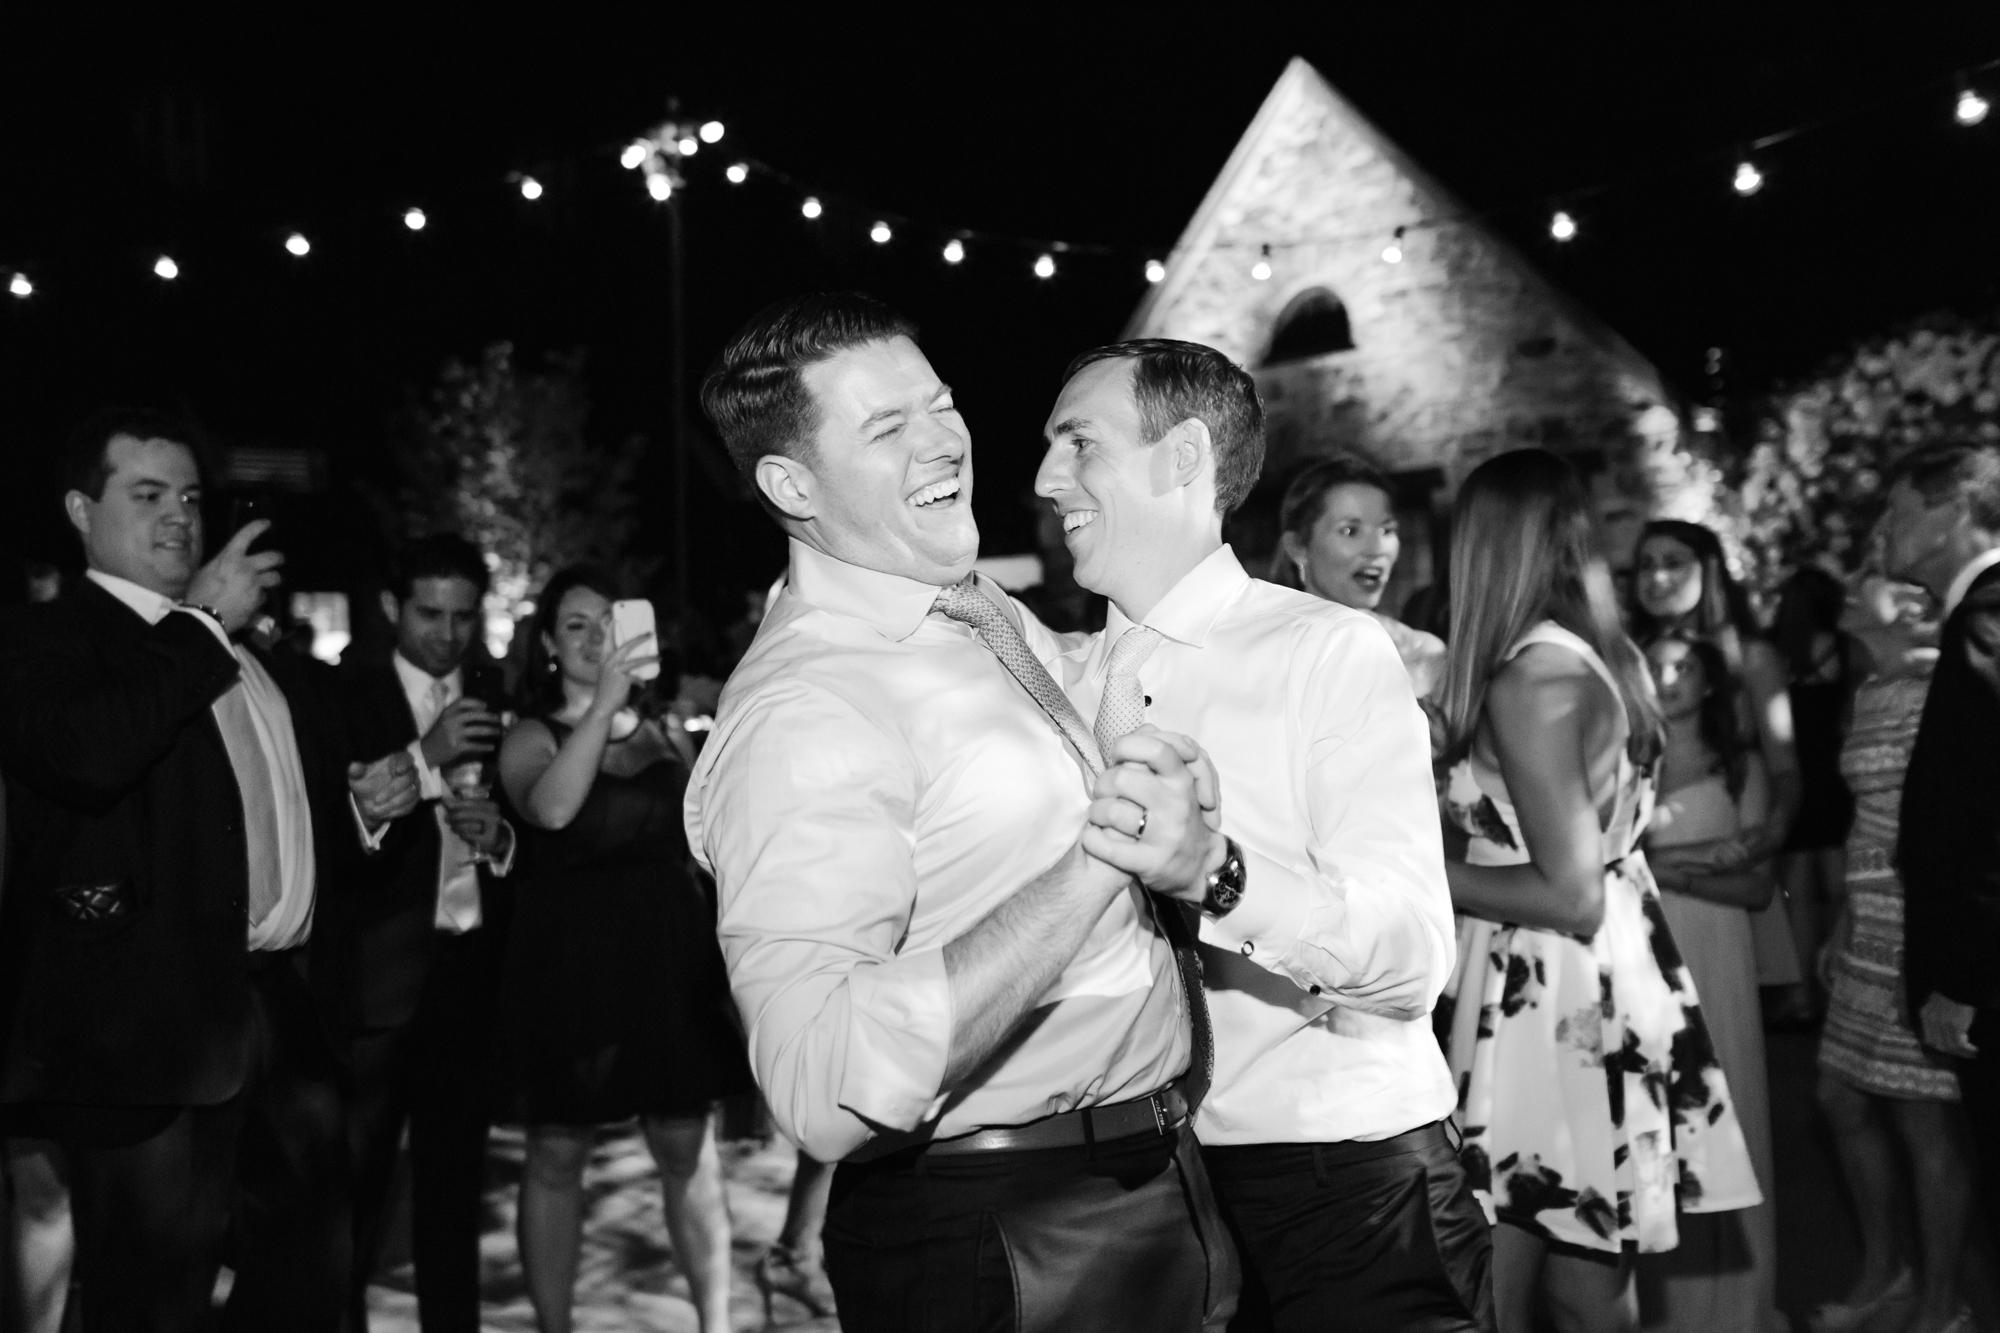 77_Jessica_Ted_Blue_Hill_Stone_Barns_Wedding_Pocantico_NY_Tanya_Salazar_Photography_191.jpg